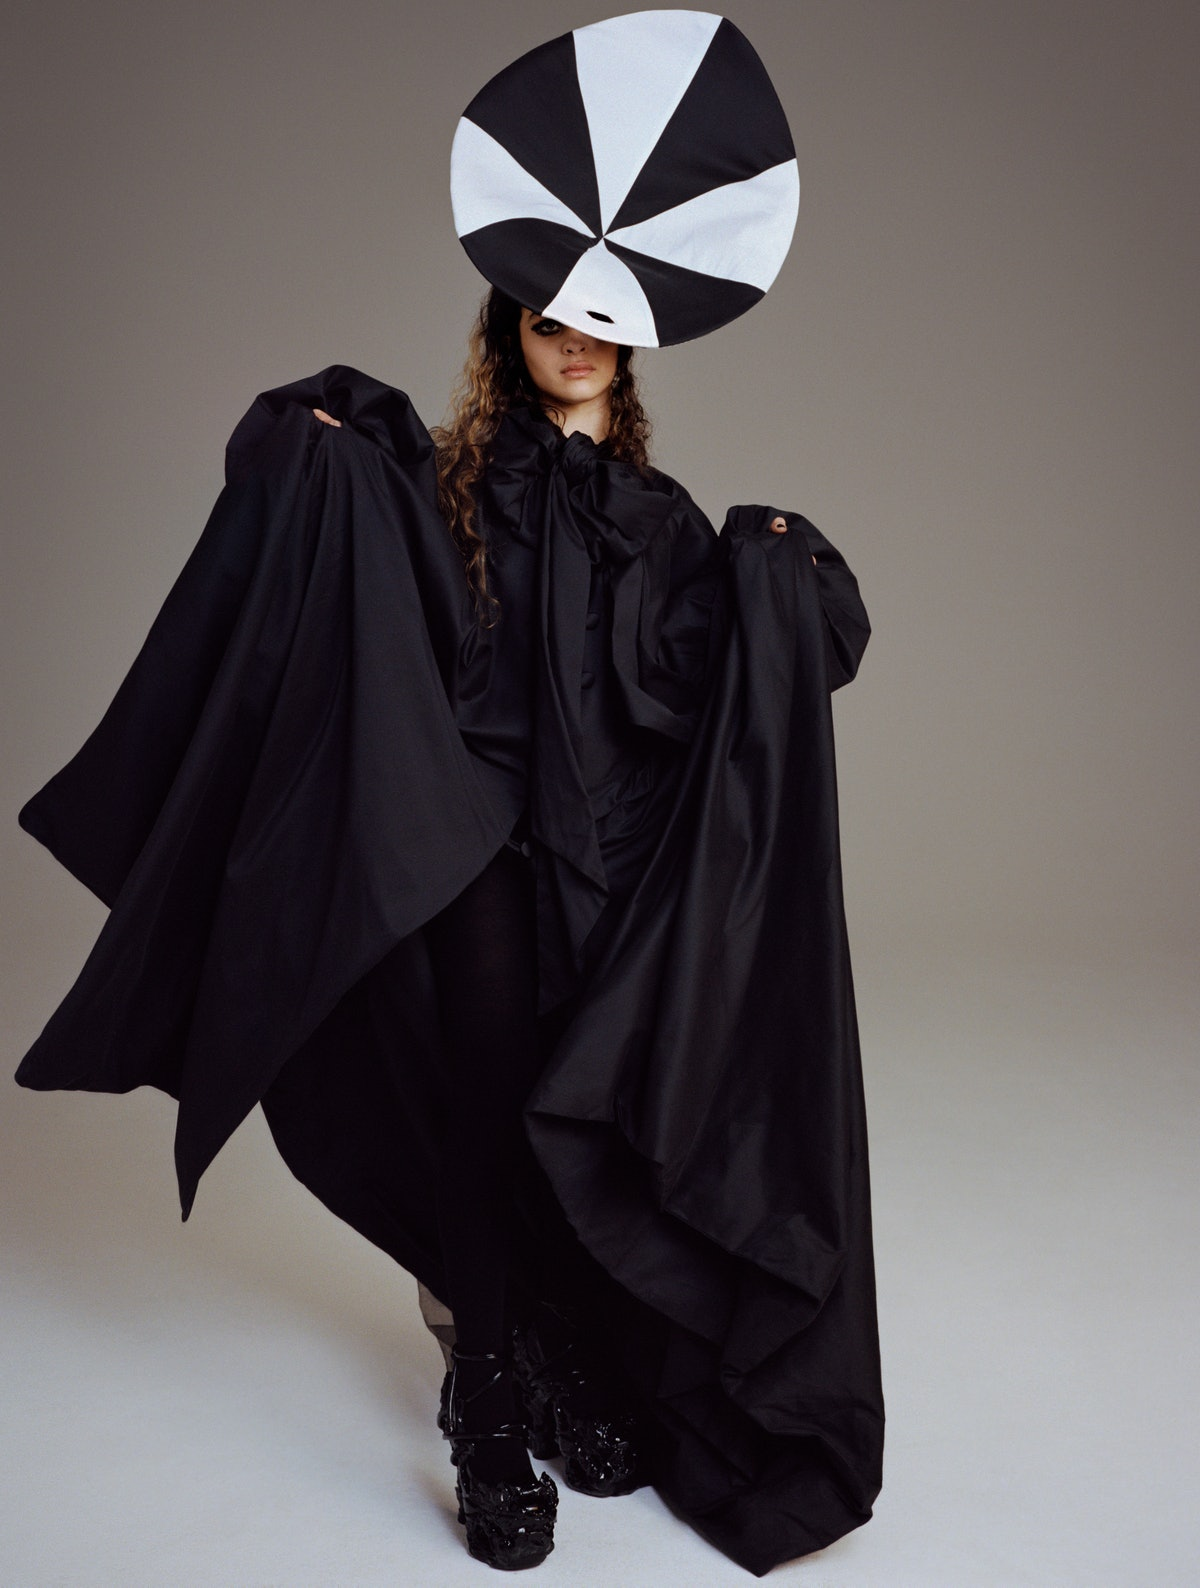 Deba Hekmat wears a Connor Baxter gown and headpiece; Comme des Garçons tights; Del Core shoes.